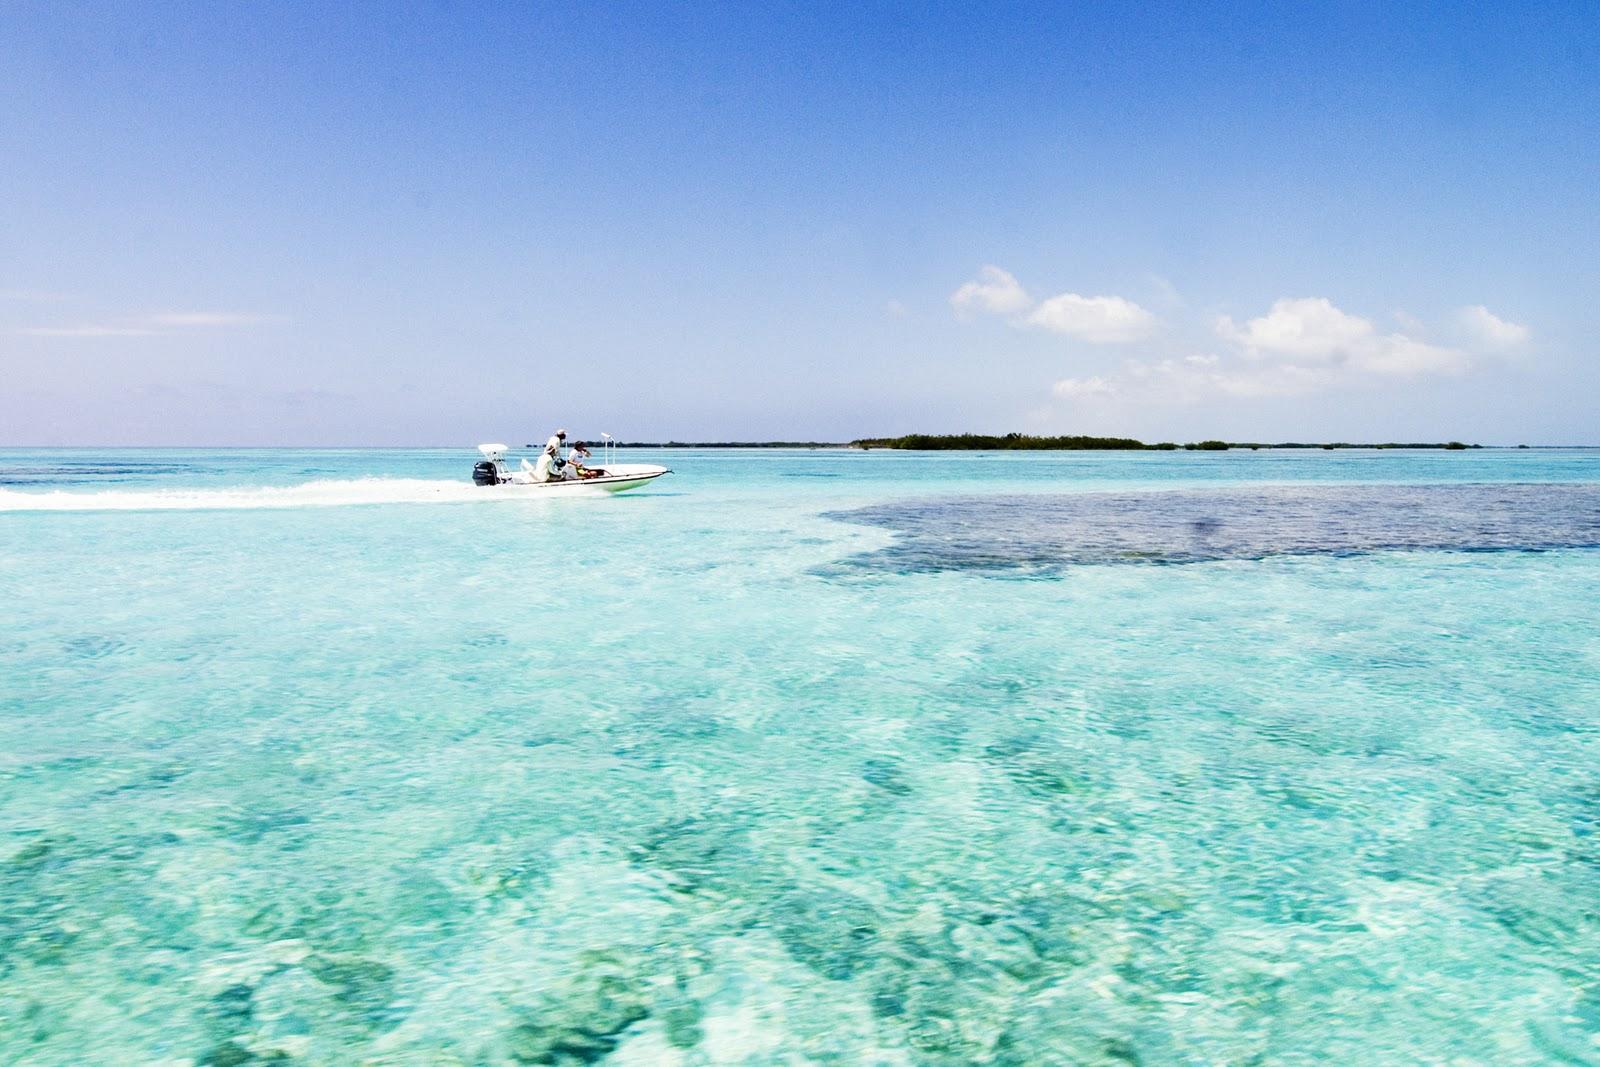 Cuba tourist attractions in cuba exotic travel destination for Best beach travel destinations